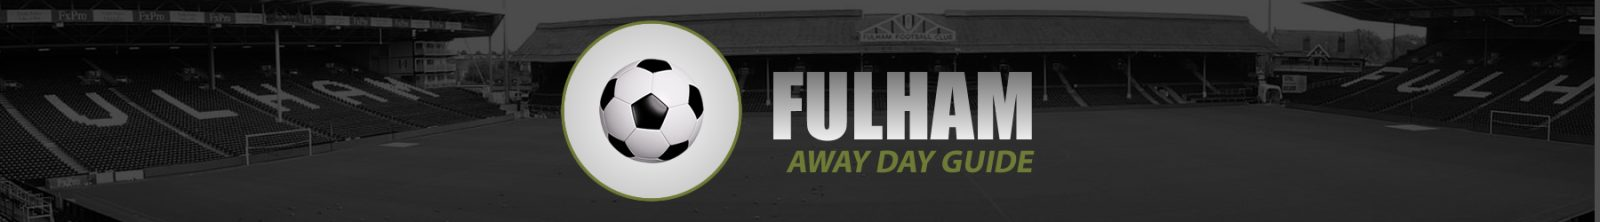 Fulham Away